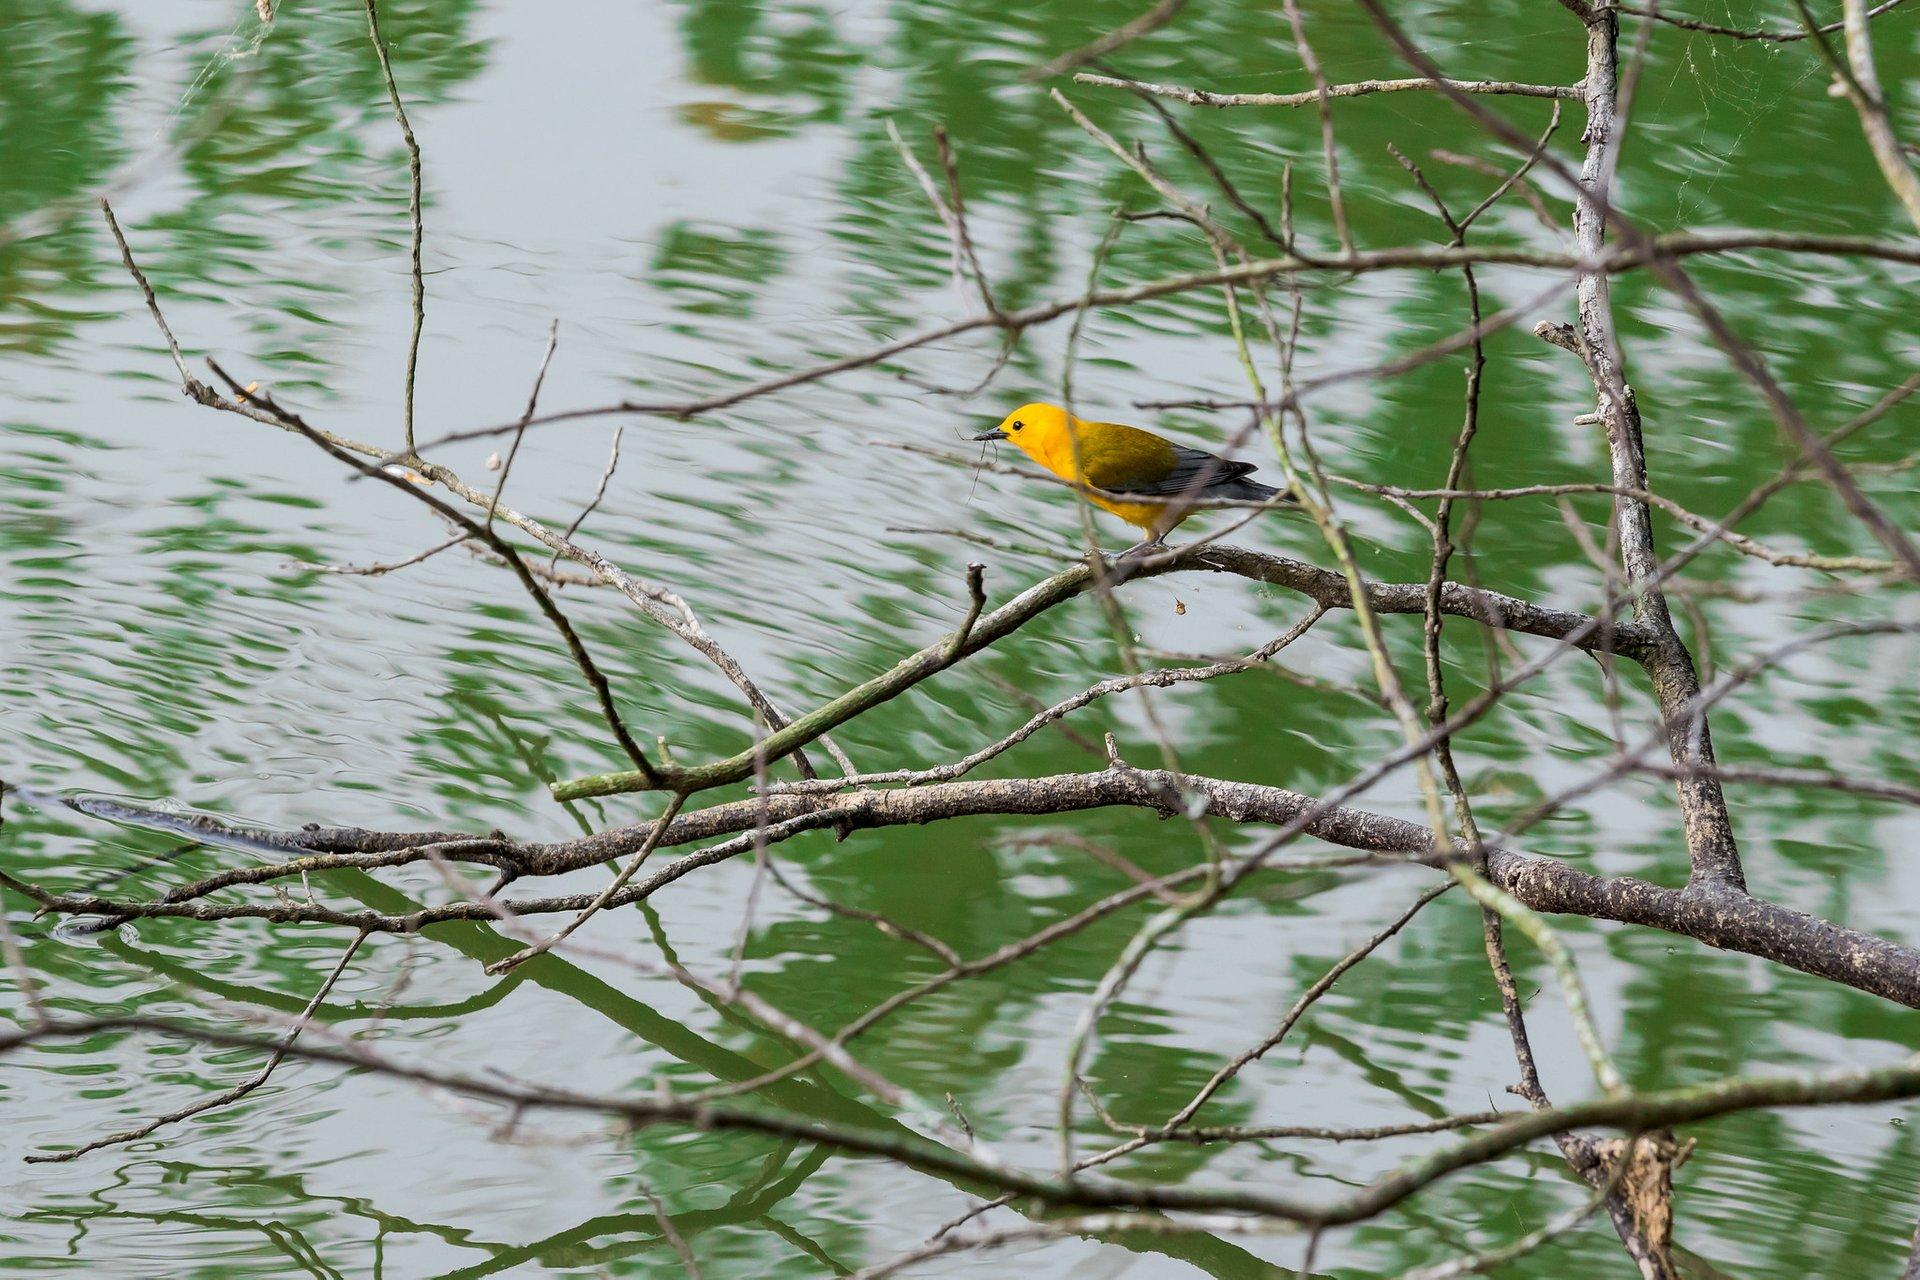 Prothonotary warbler (Protonotaria citrea) at Radnor Lake State Park 2020